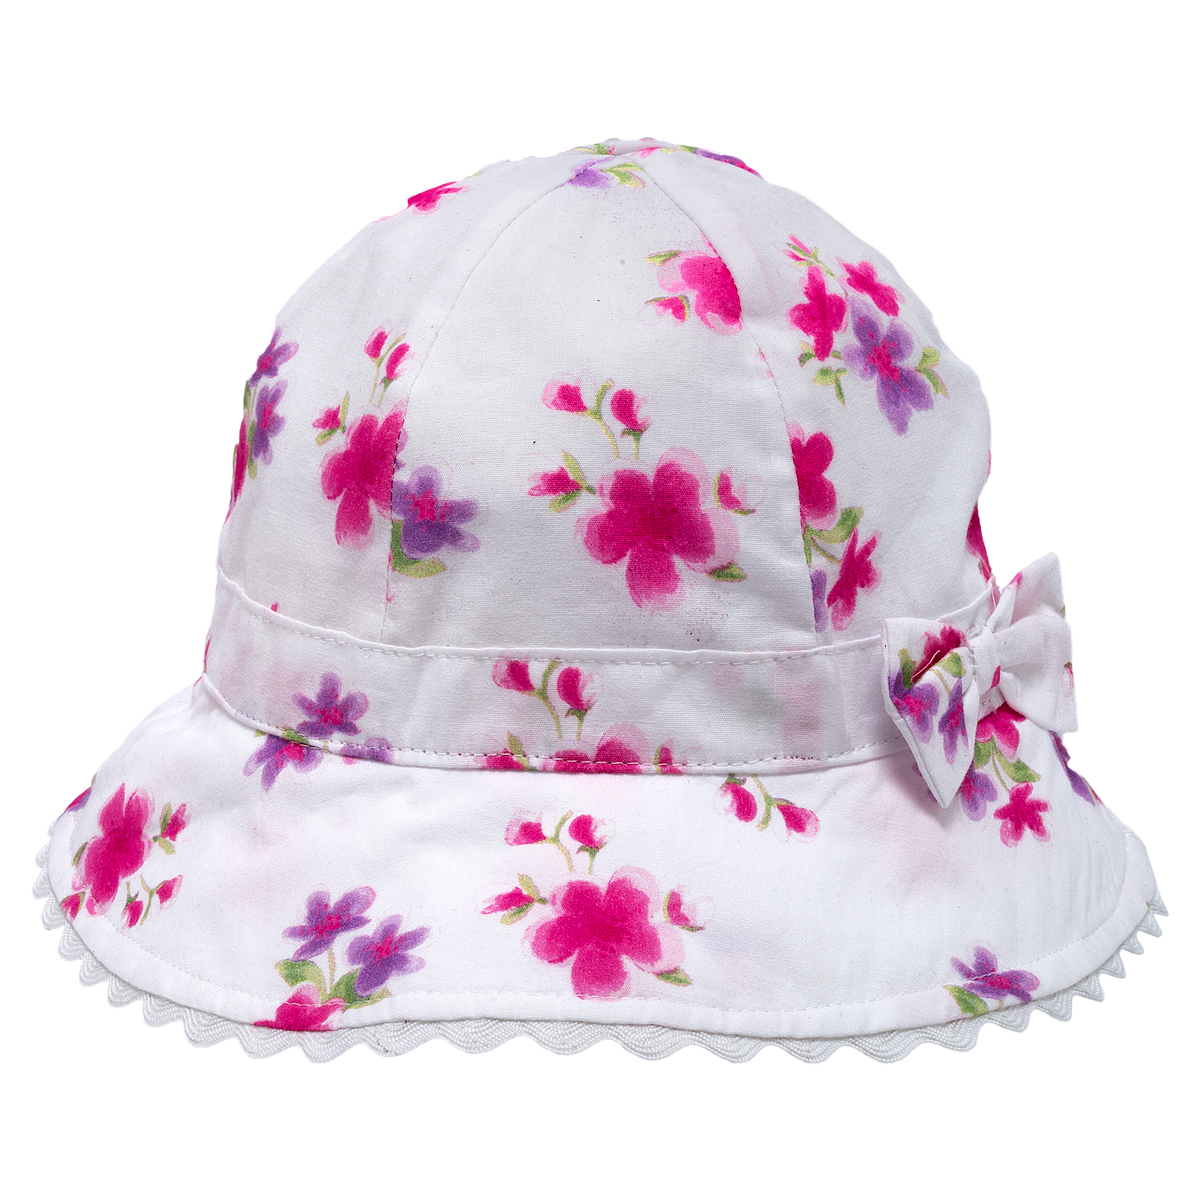 Palarie fetite Chicco Blis, fundita, alb cu roz, 04473 din categoria Caciuli, Sepci